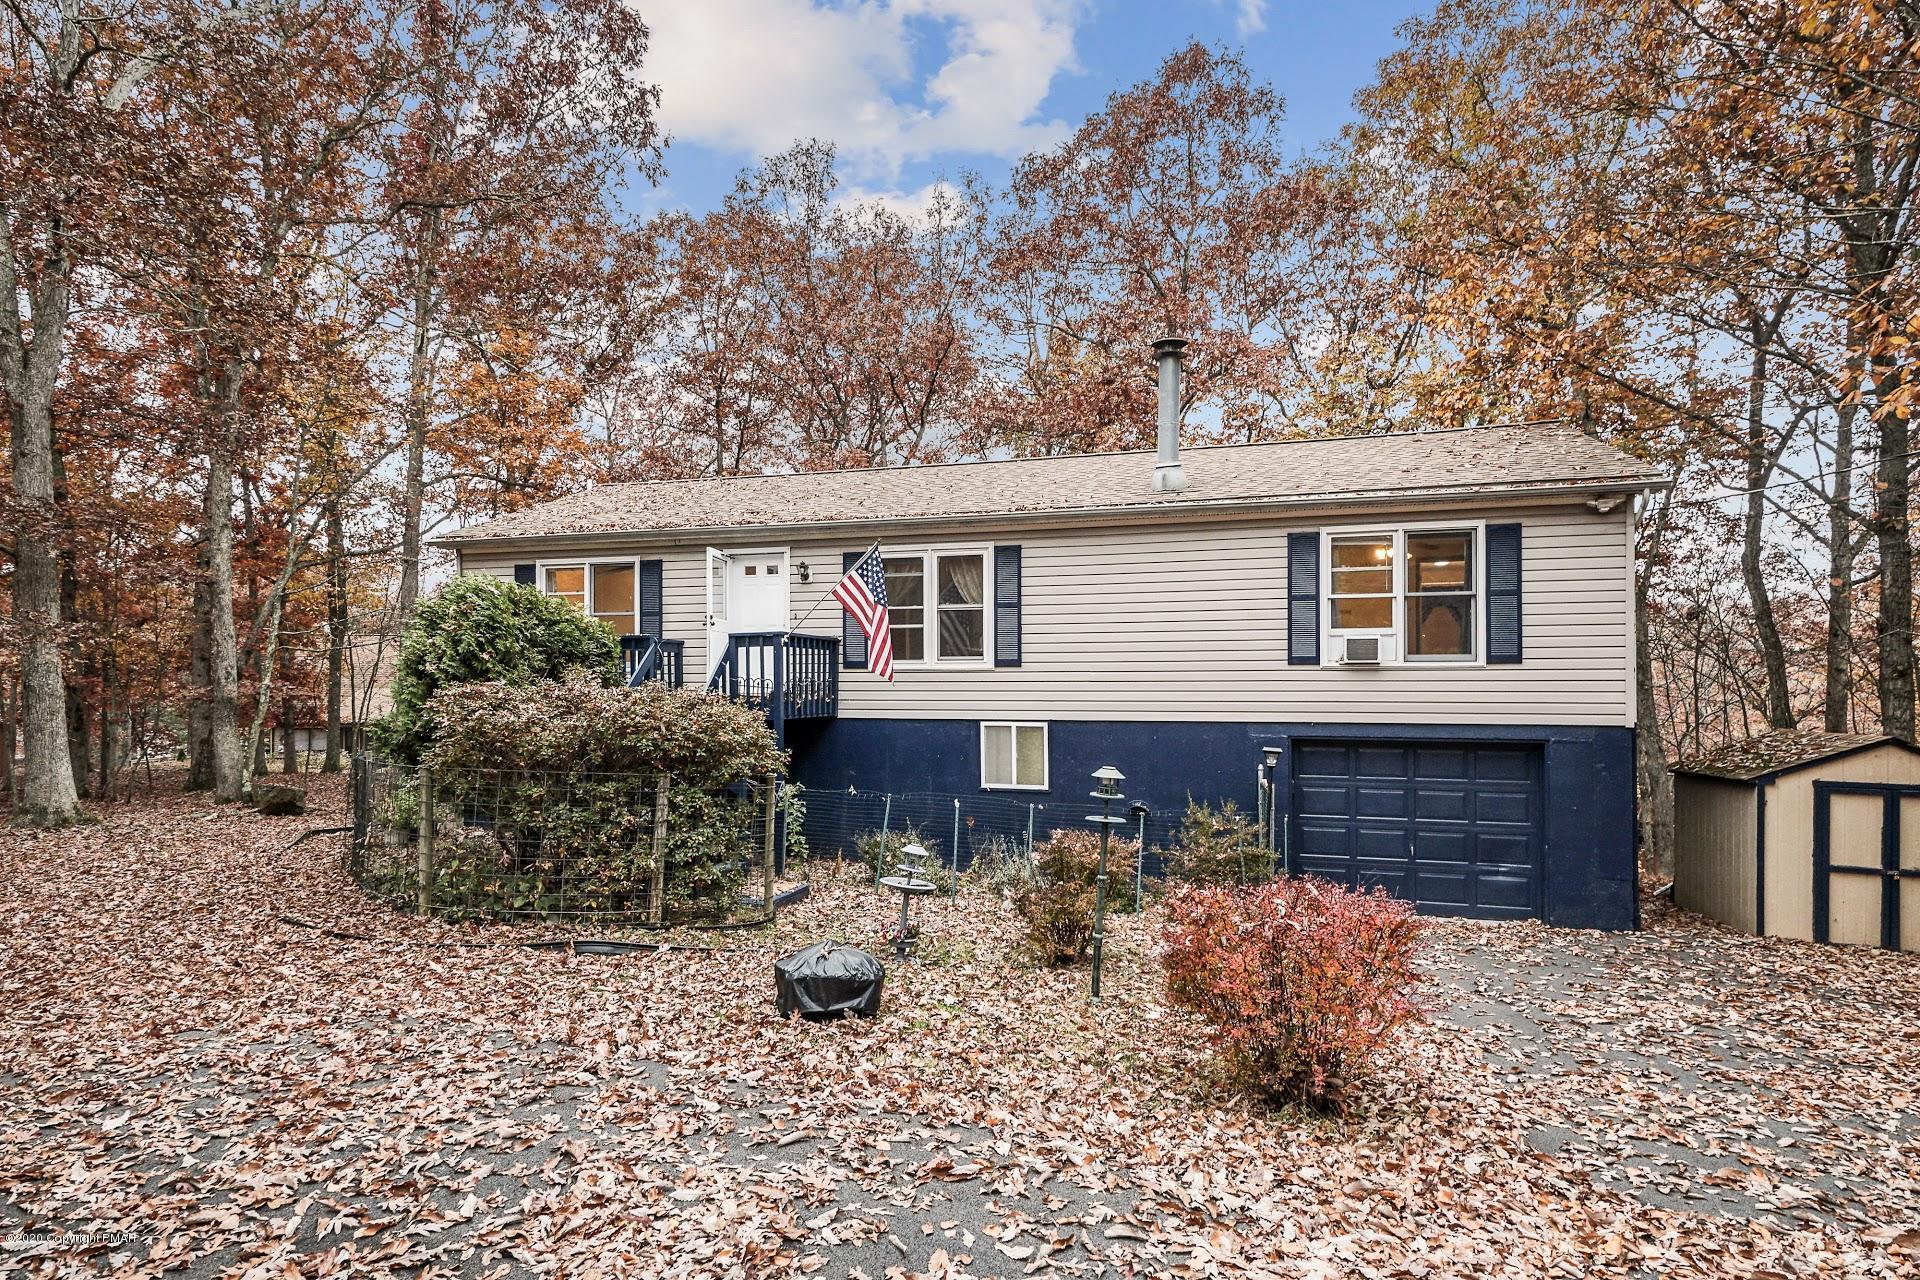 6186 Decker Rd, Bushkill, PA 18324